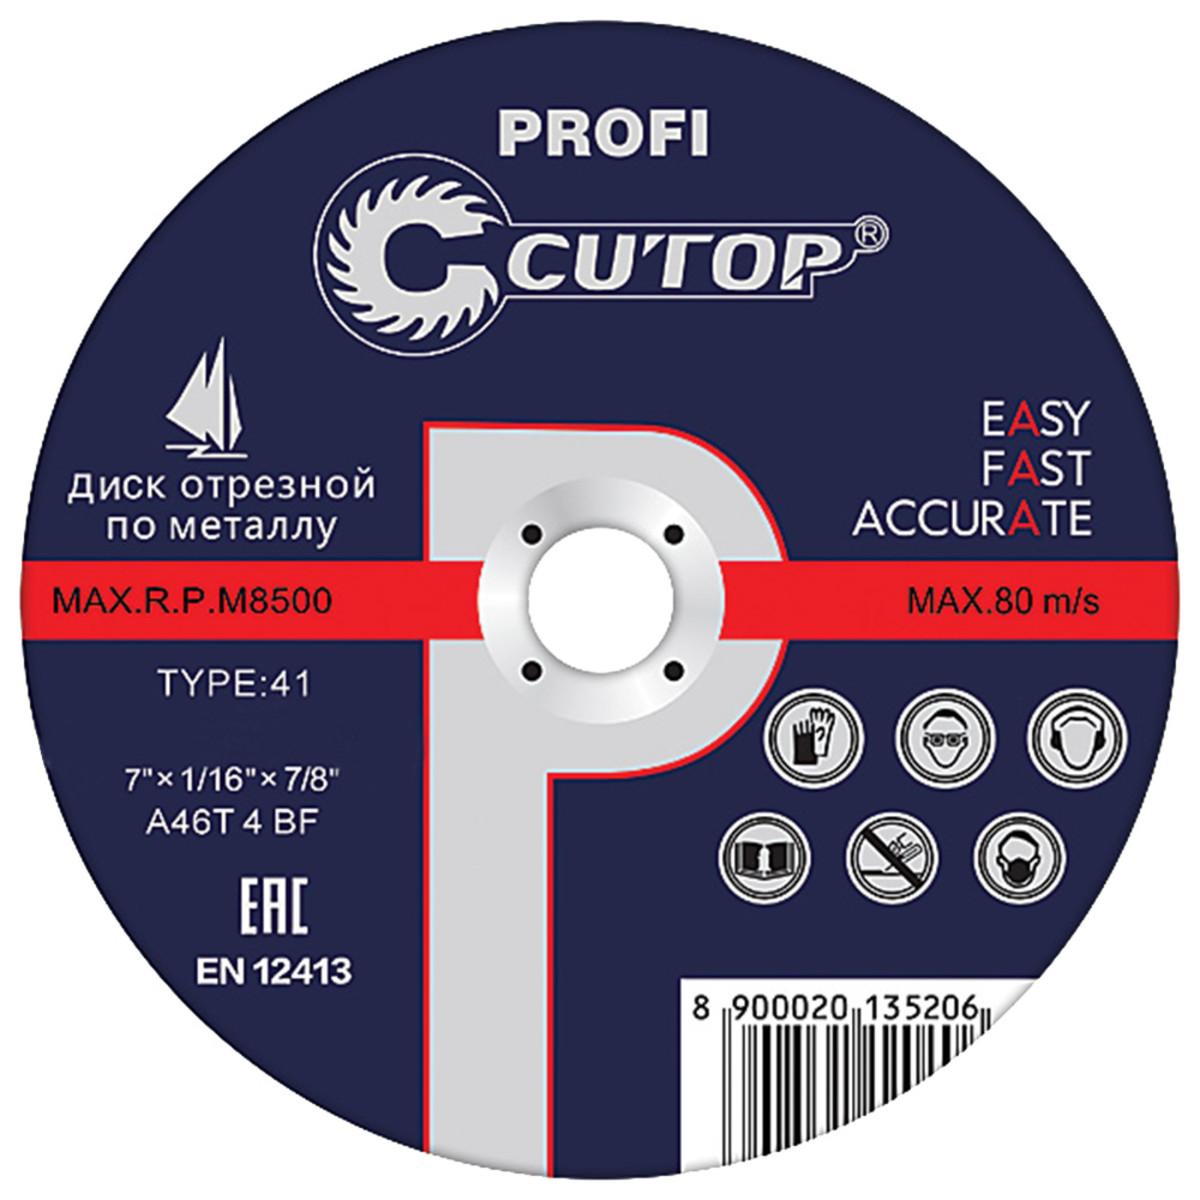 Диск отрезной по металлу Cutop Profi CUTOP T41 D150 мм 39986т